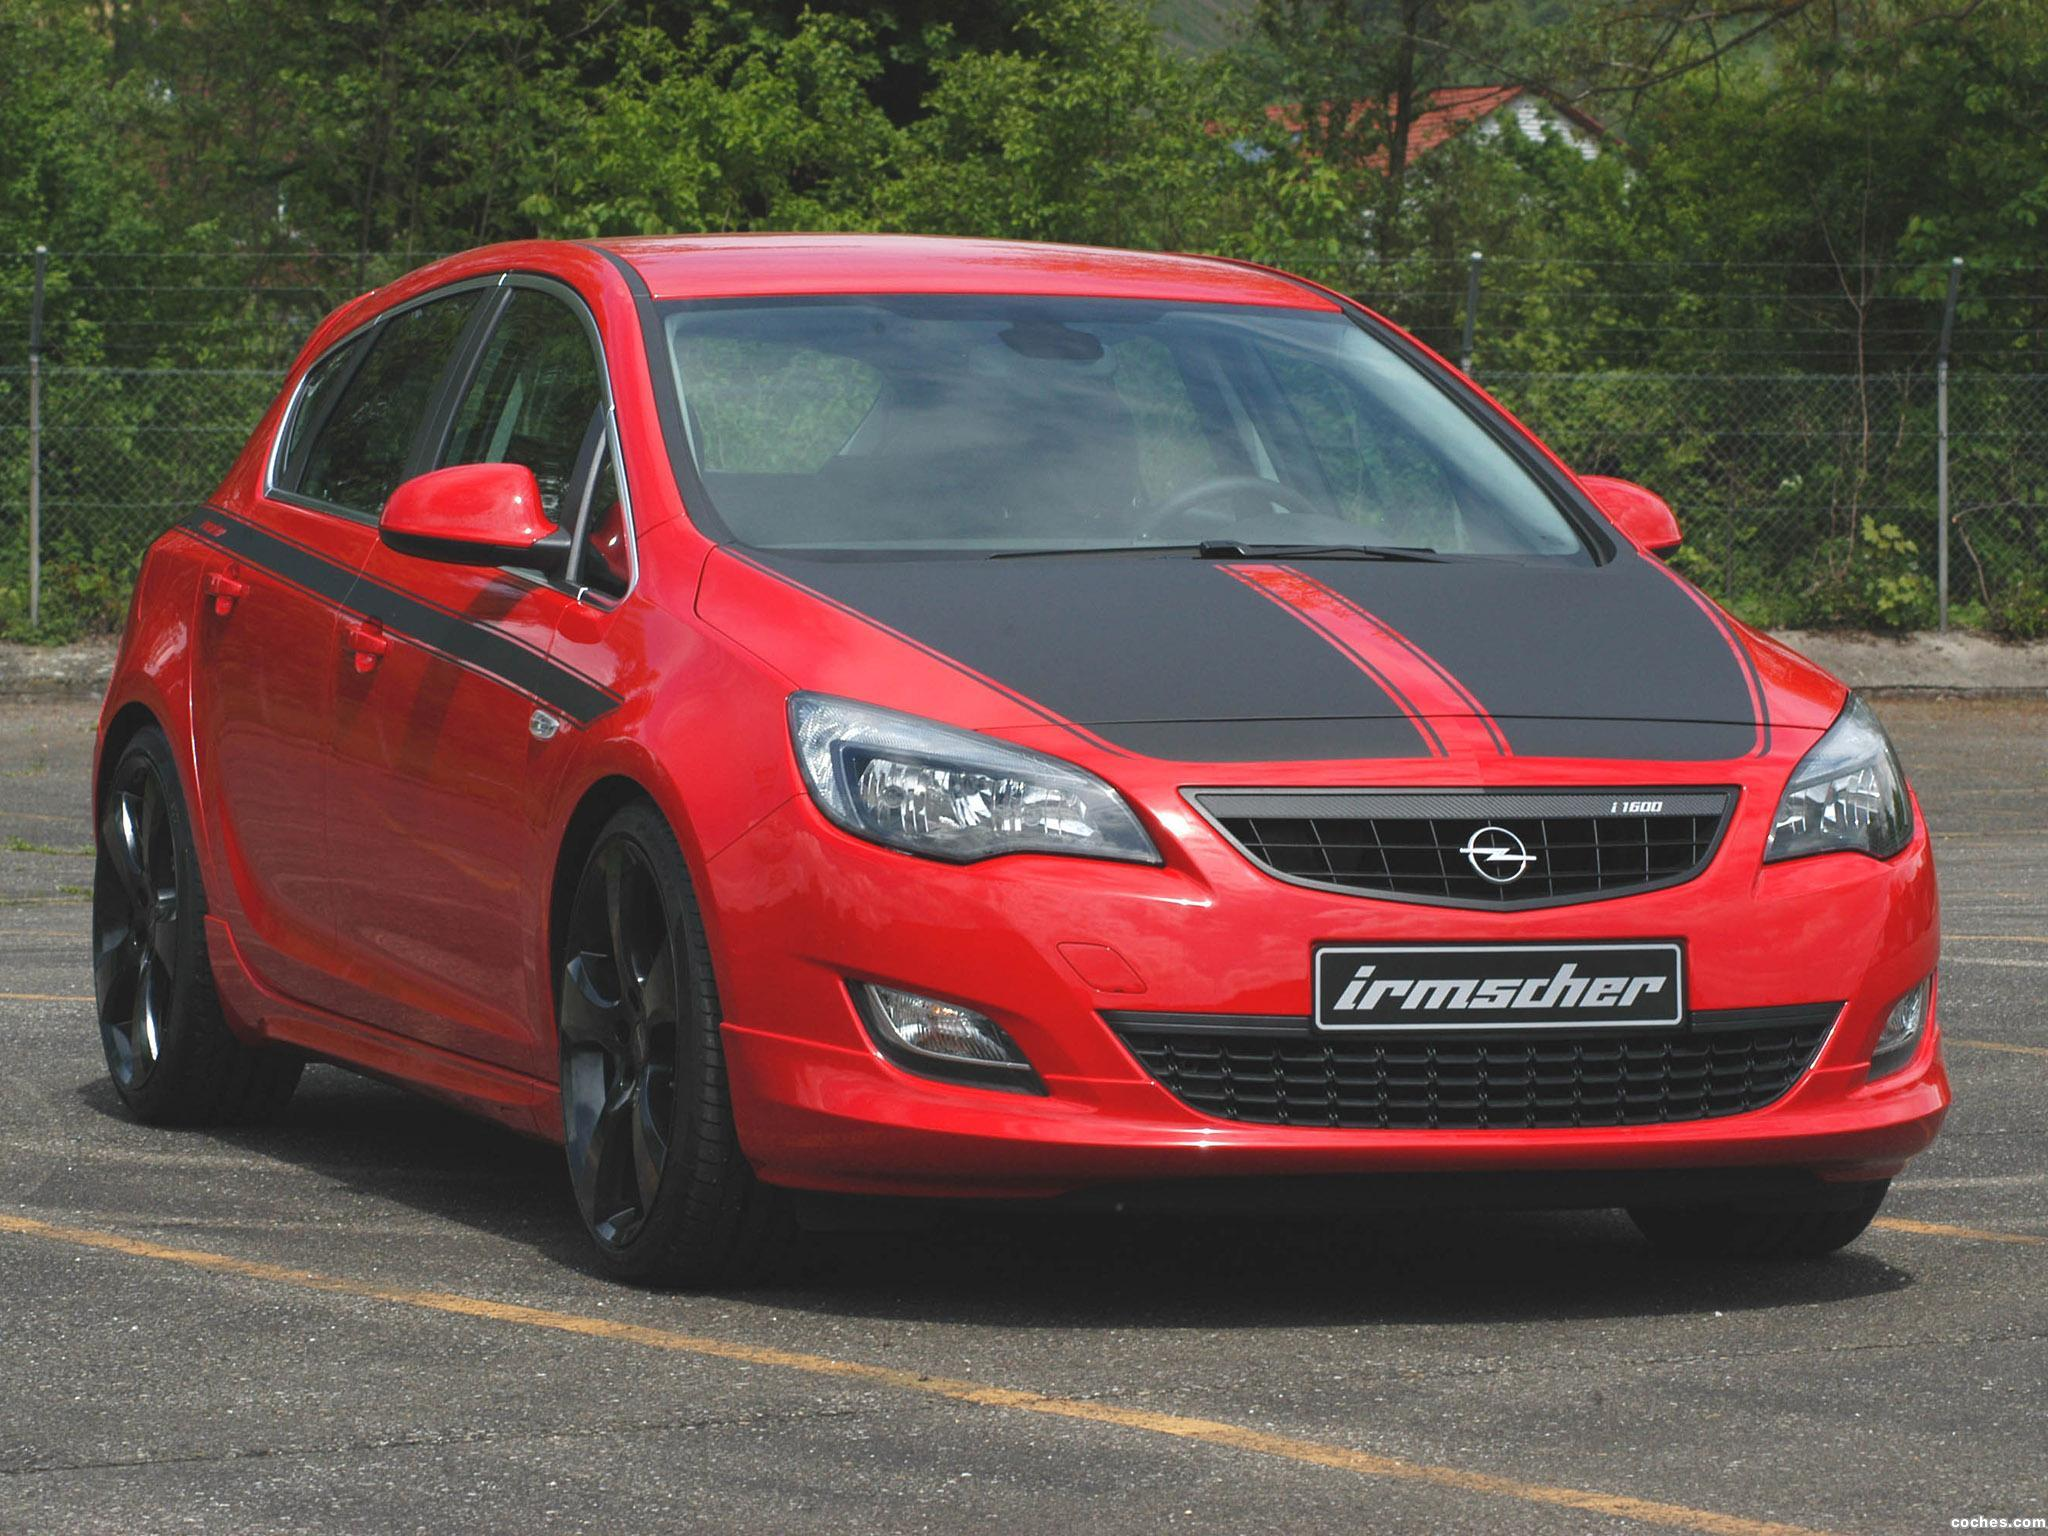 Foto 0 de Irmscher Opel Astra i1600 2010